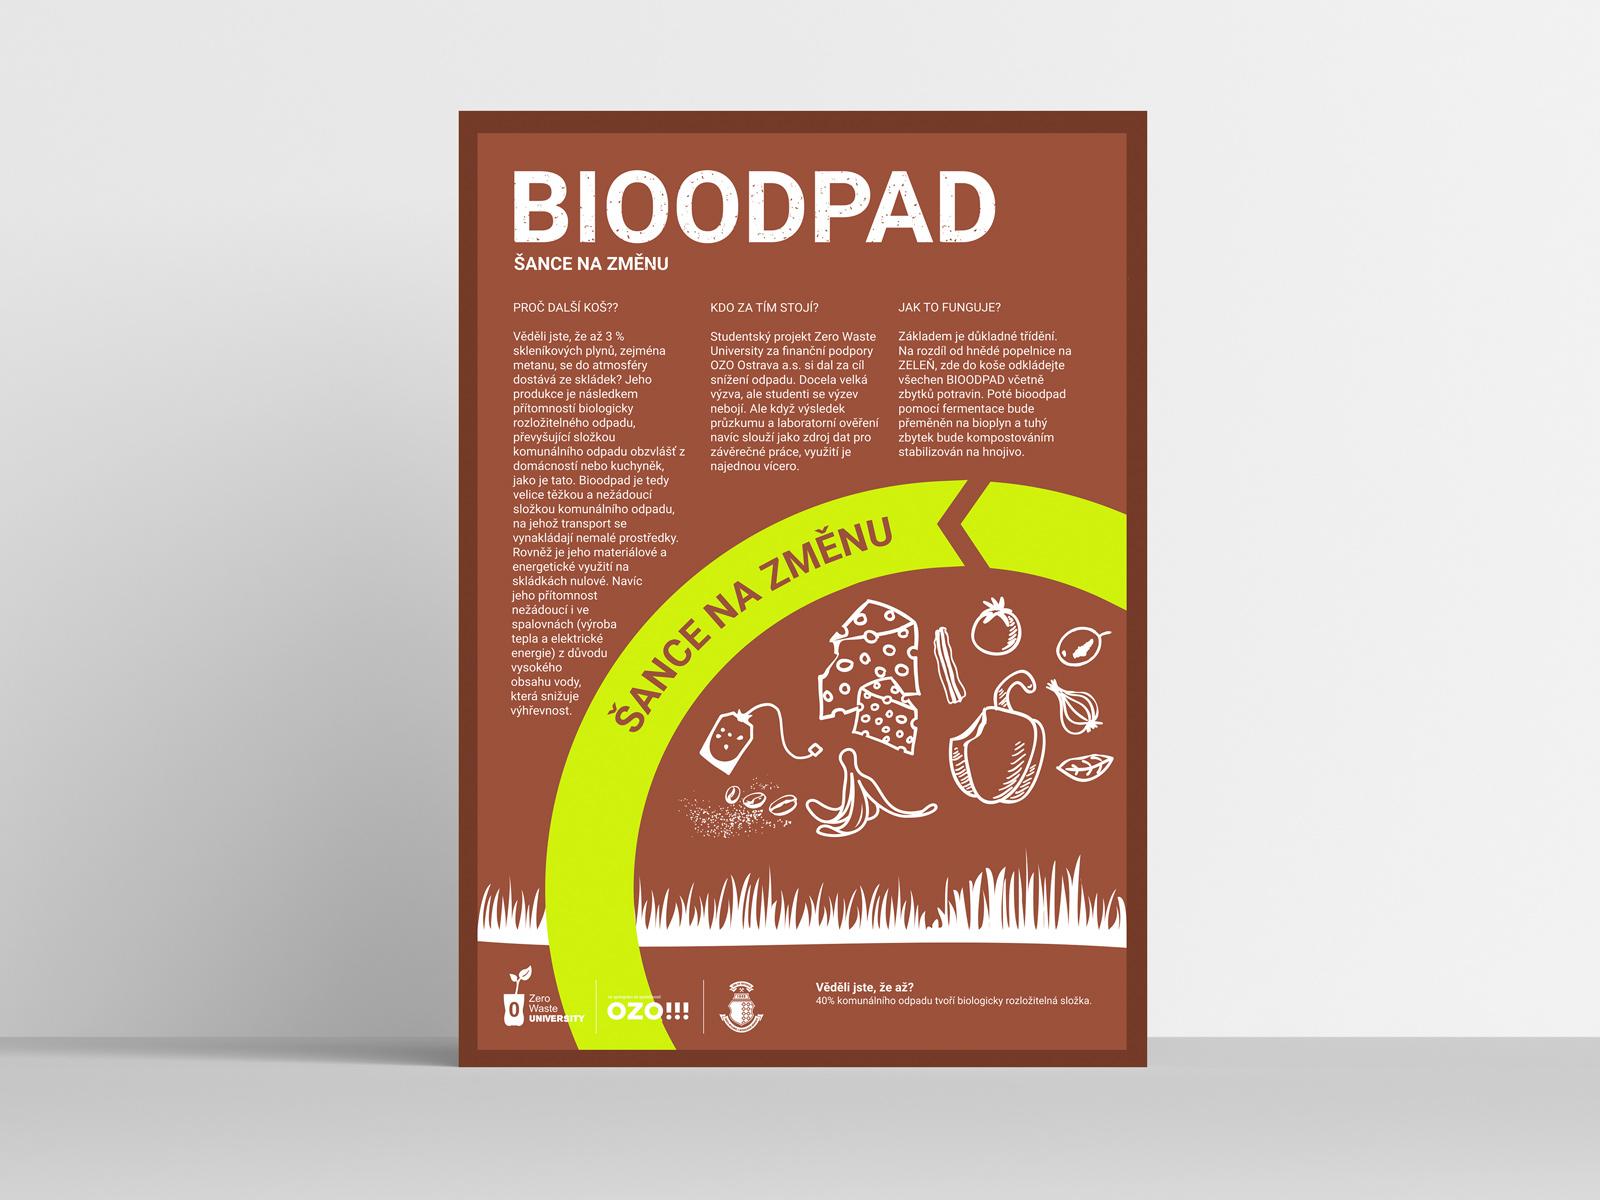 Poster o biootpadu projekta Zero Waste University u Ostravi